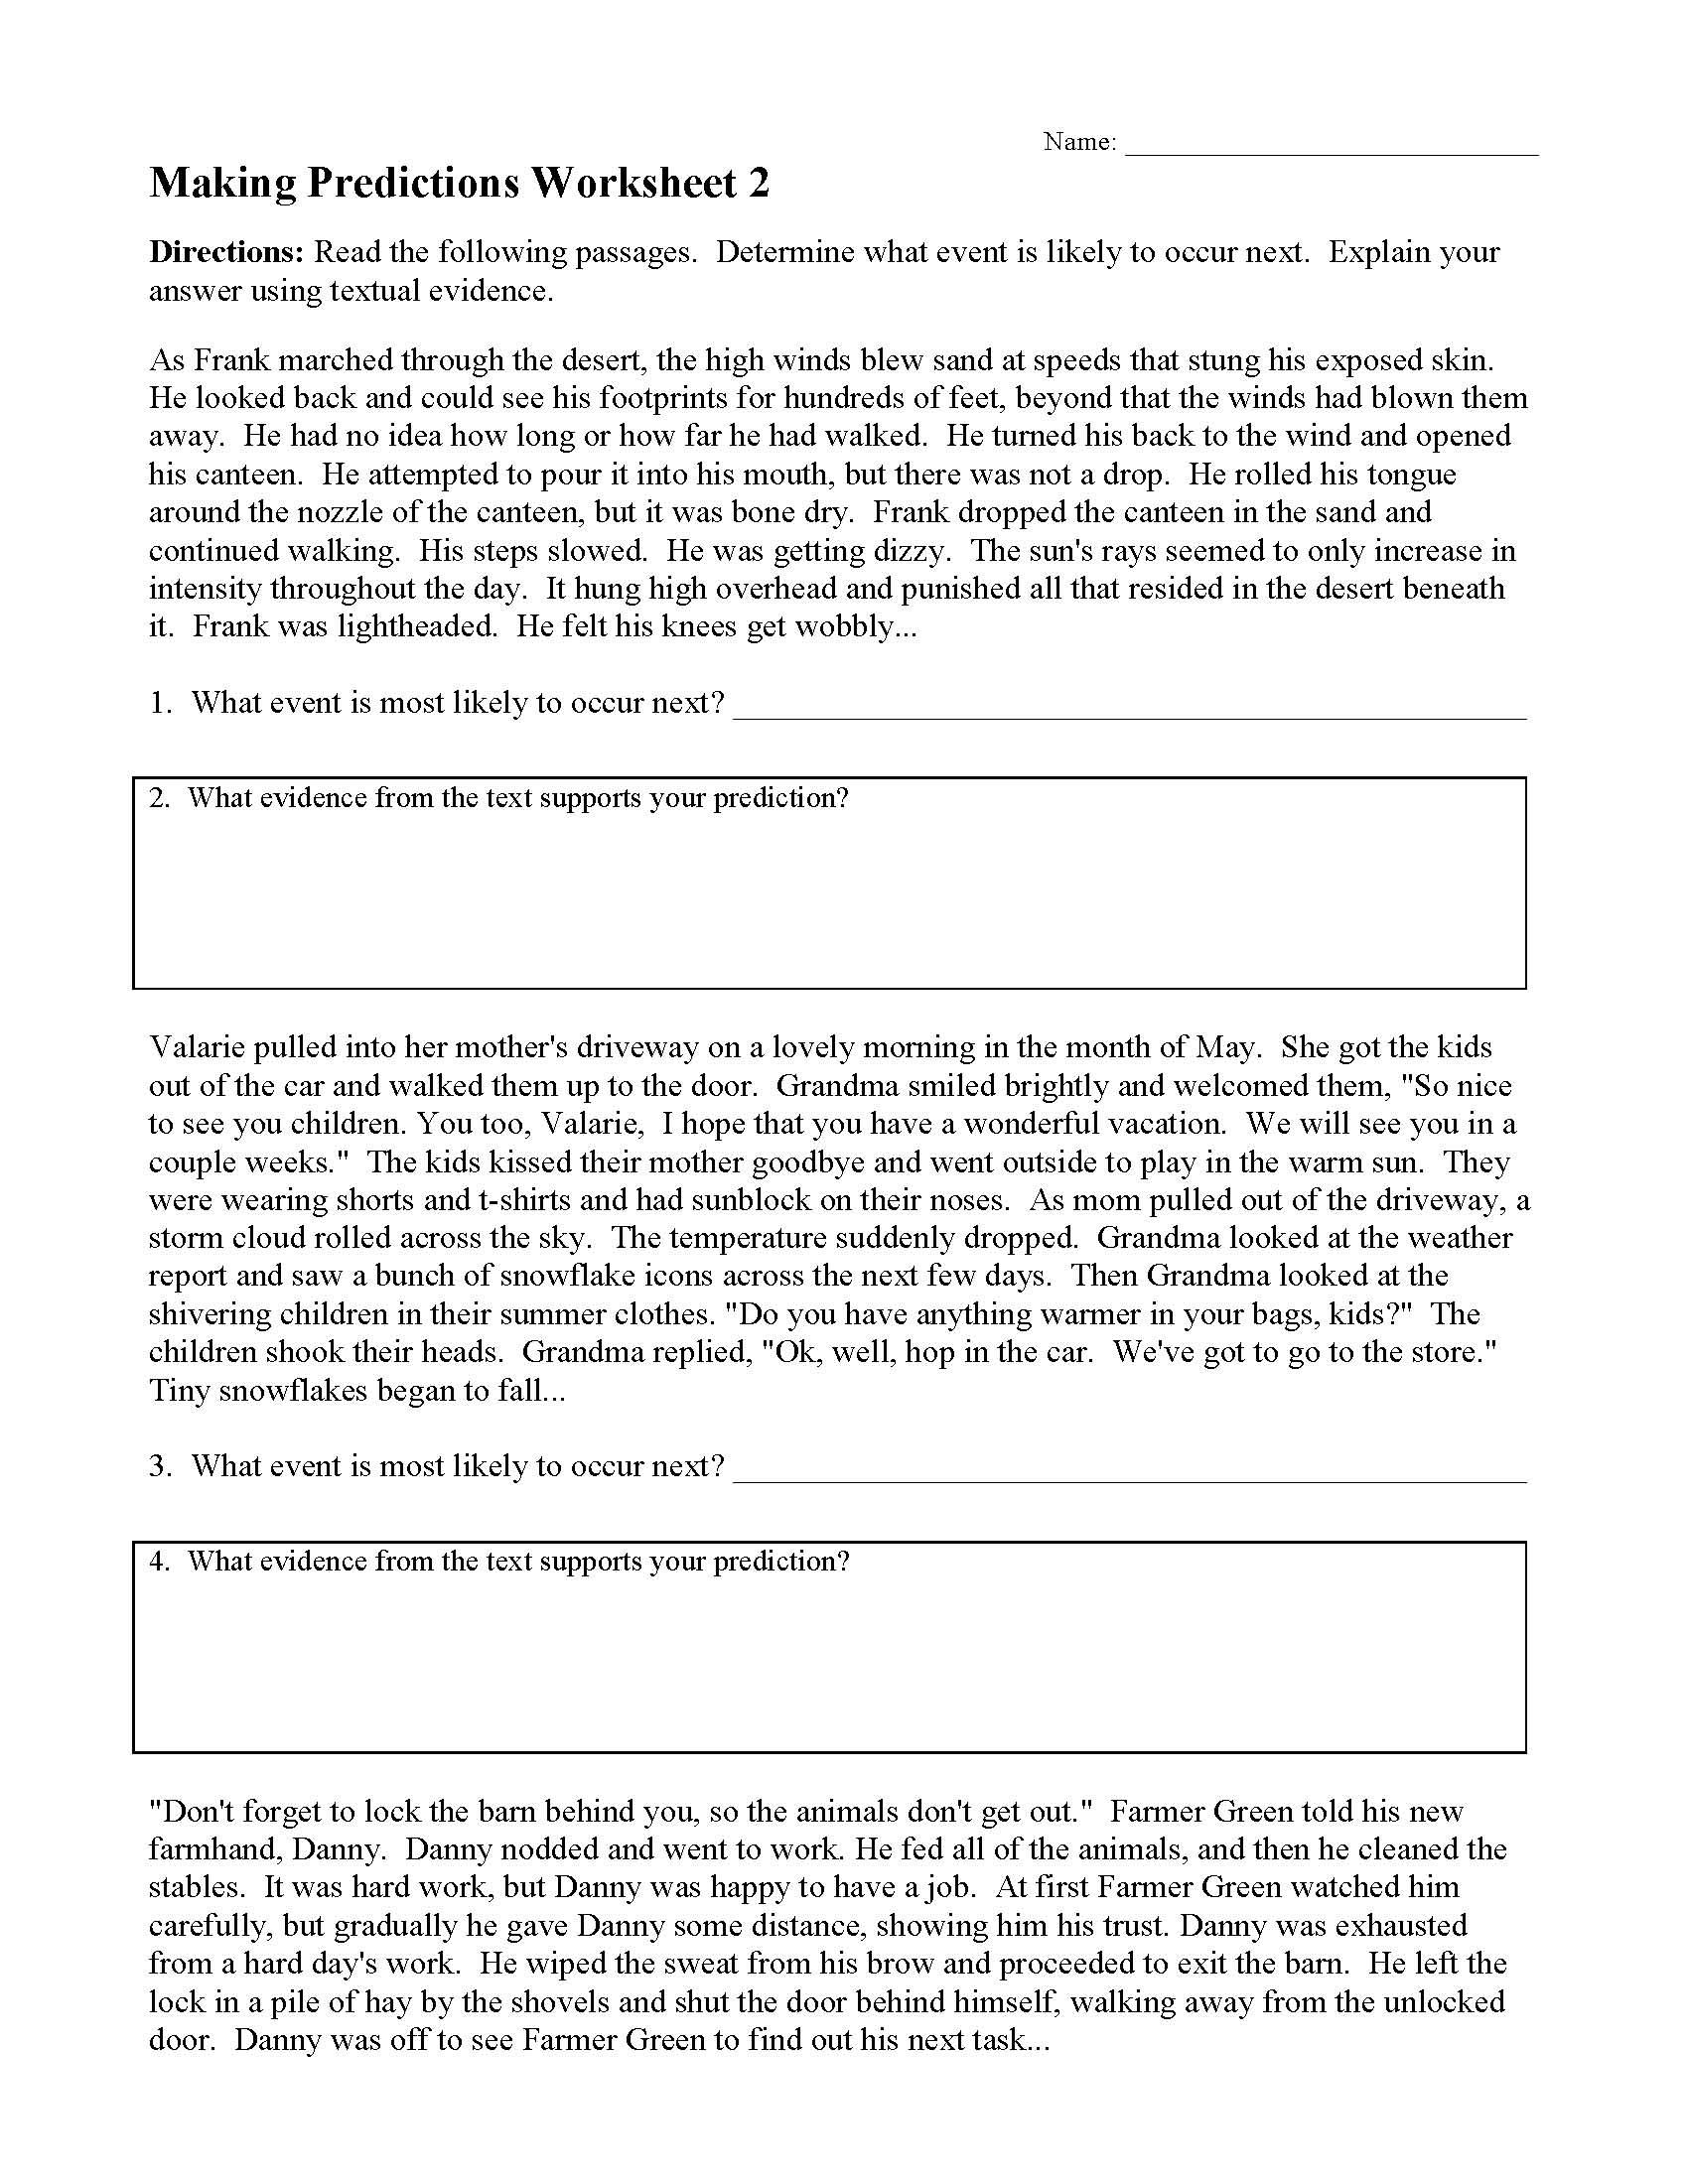 Making Predictions Worksheet 2